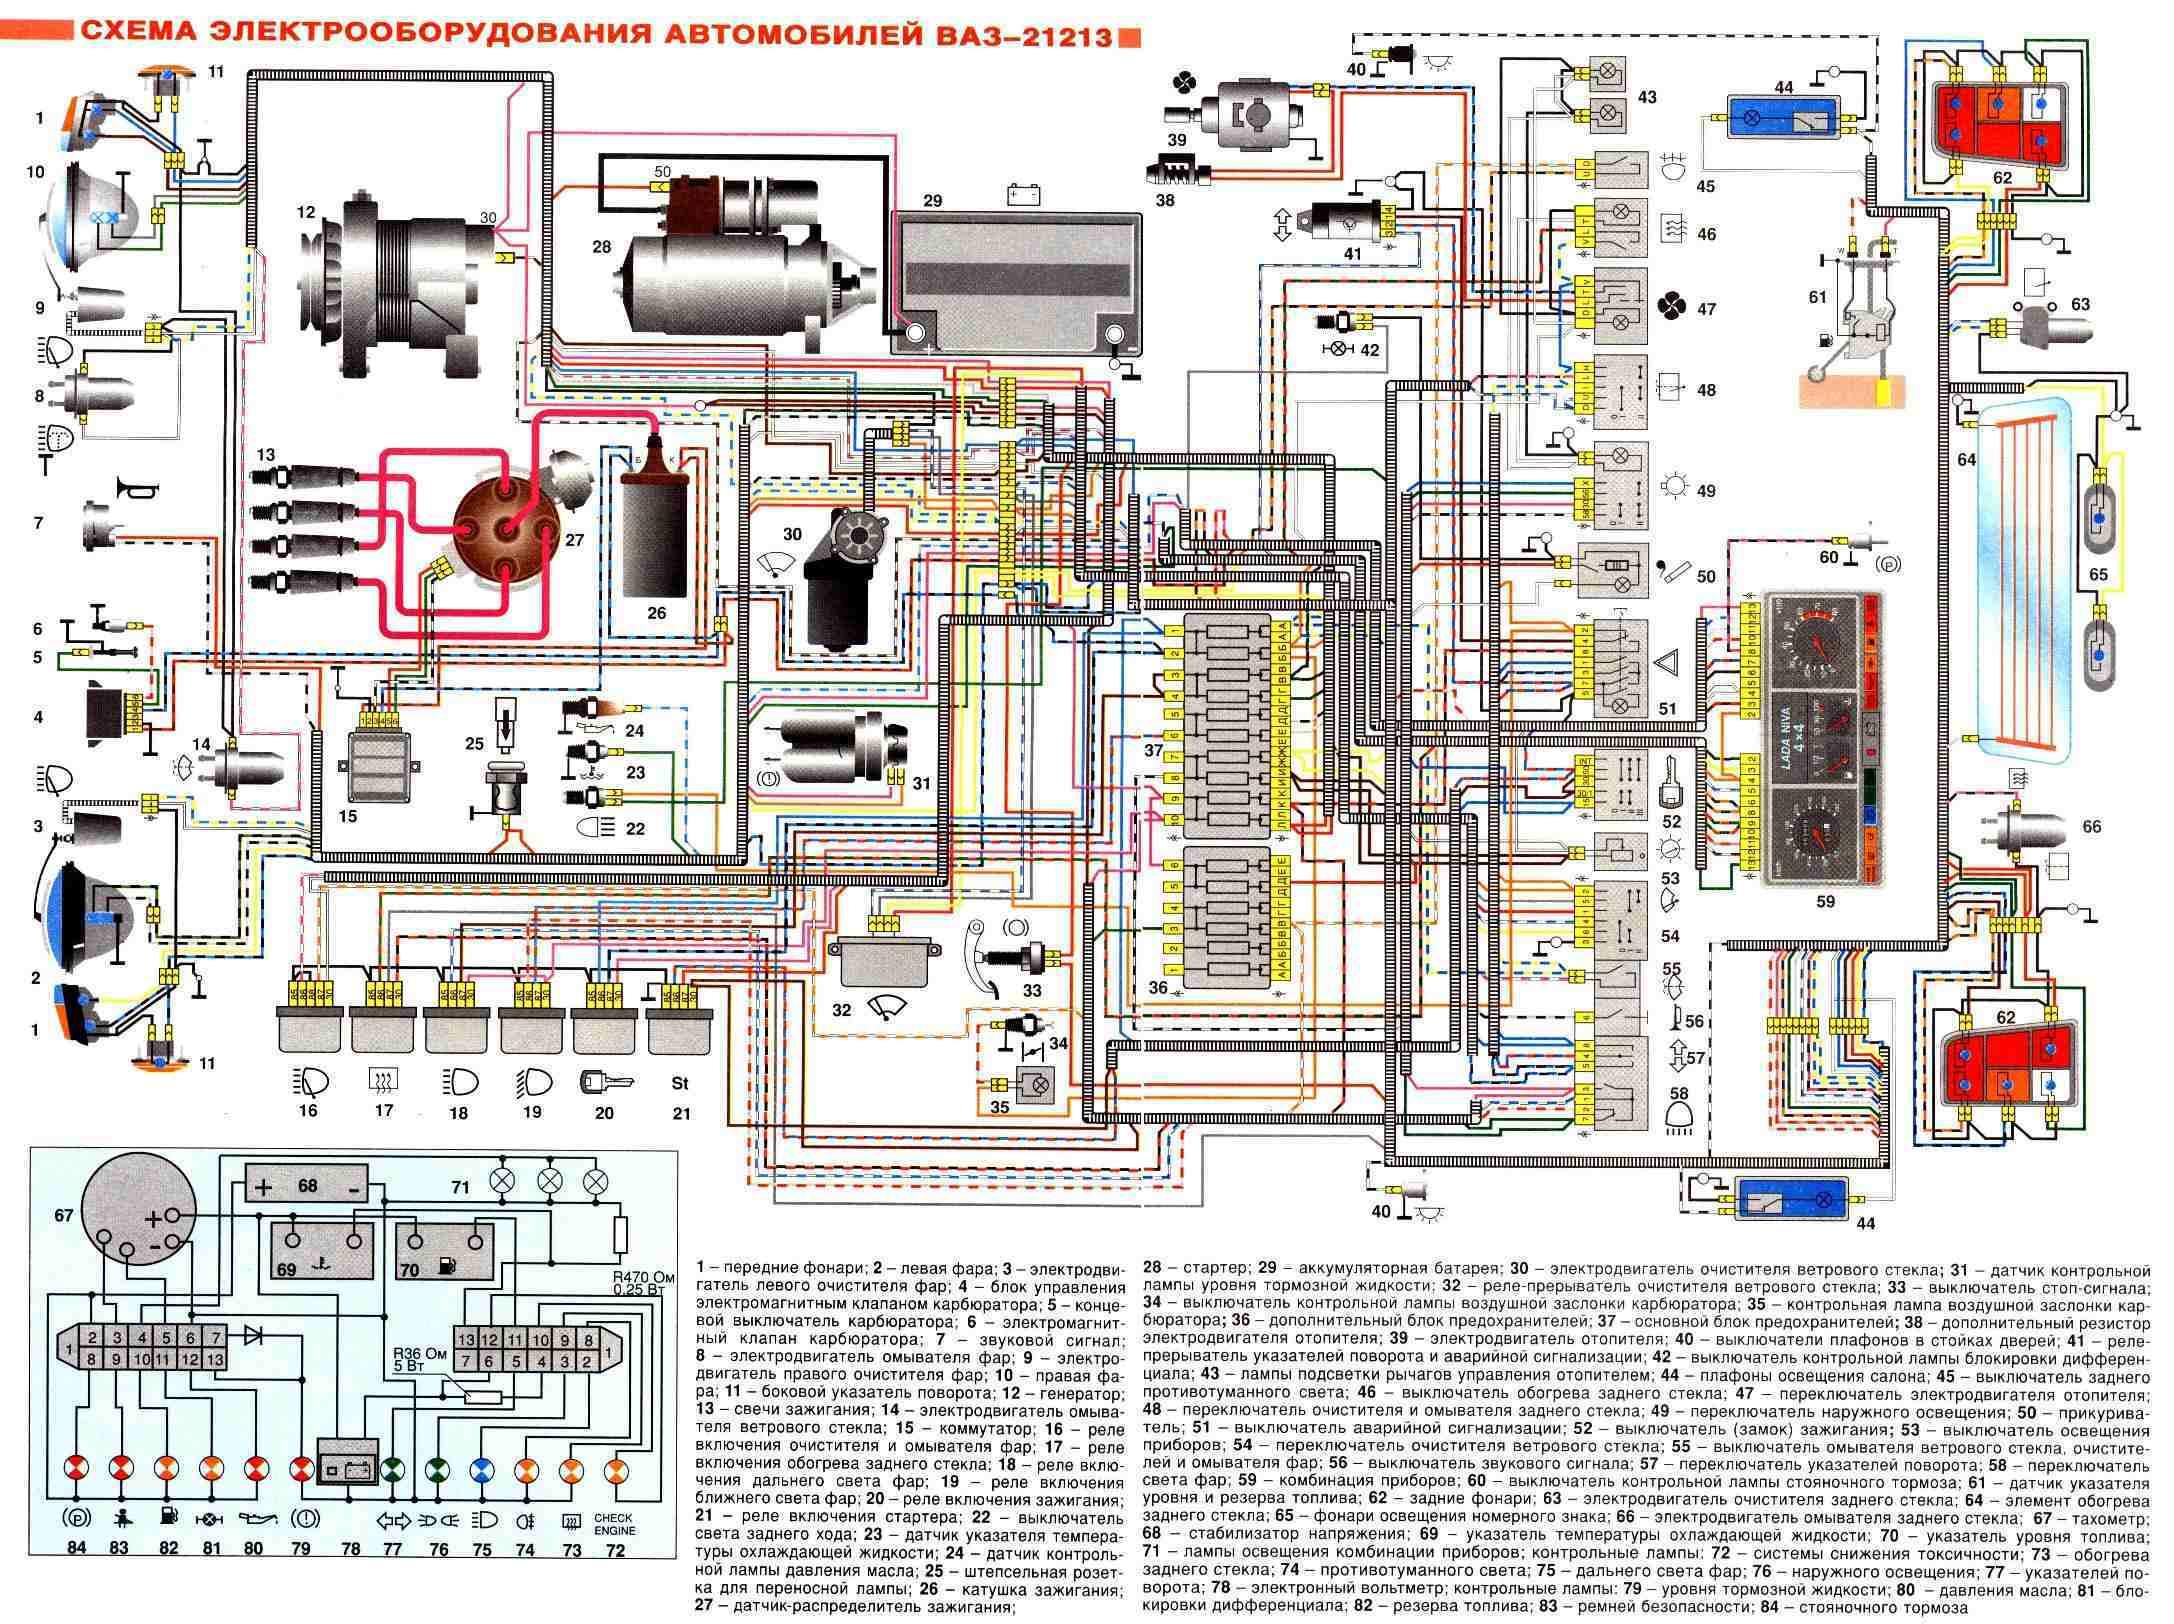 ВАЗ + Mультимедийное руков схема электропроводки daewoo matiz.